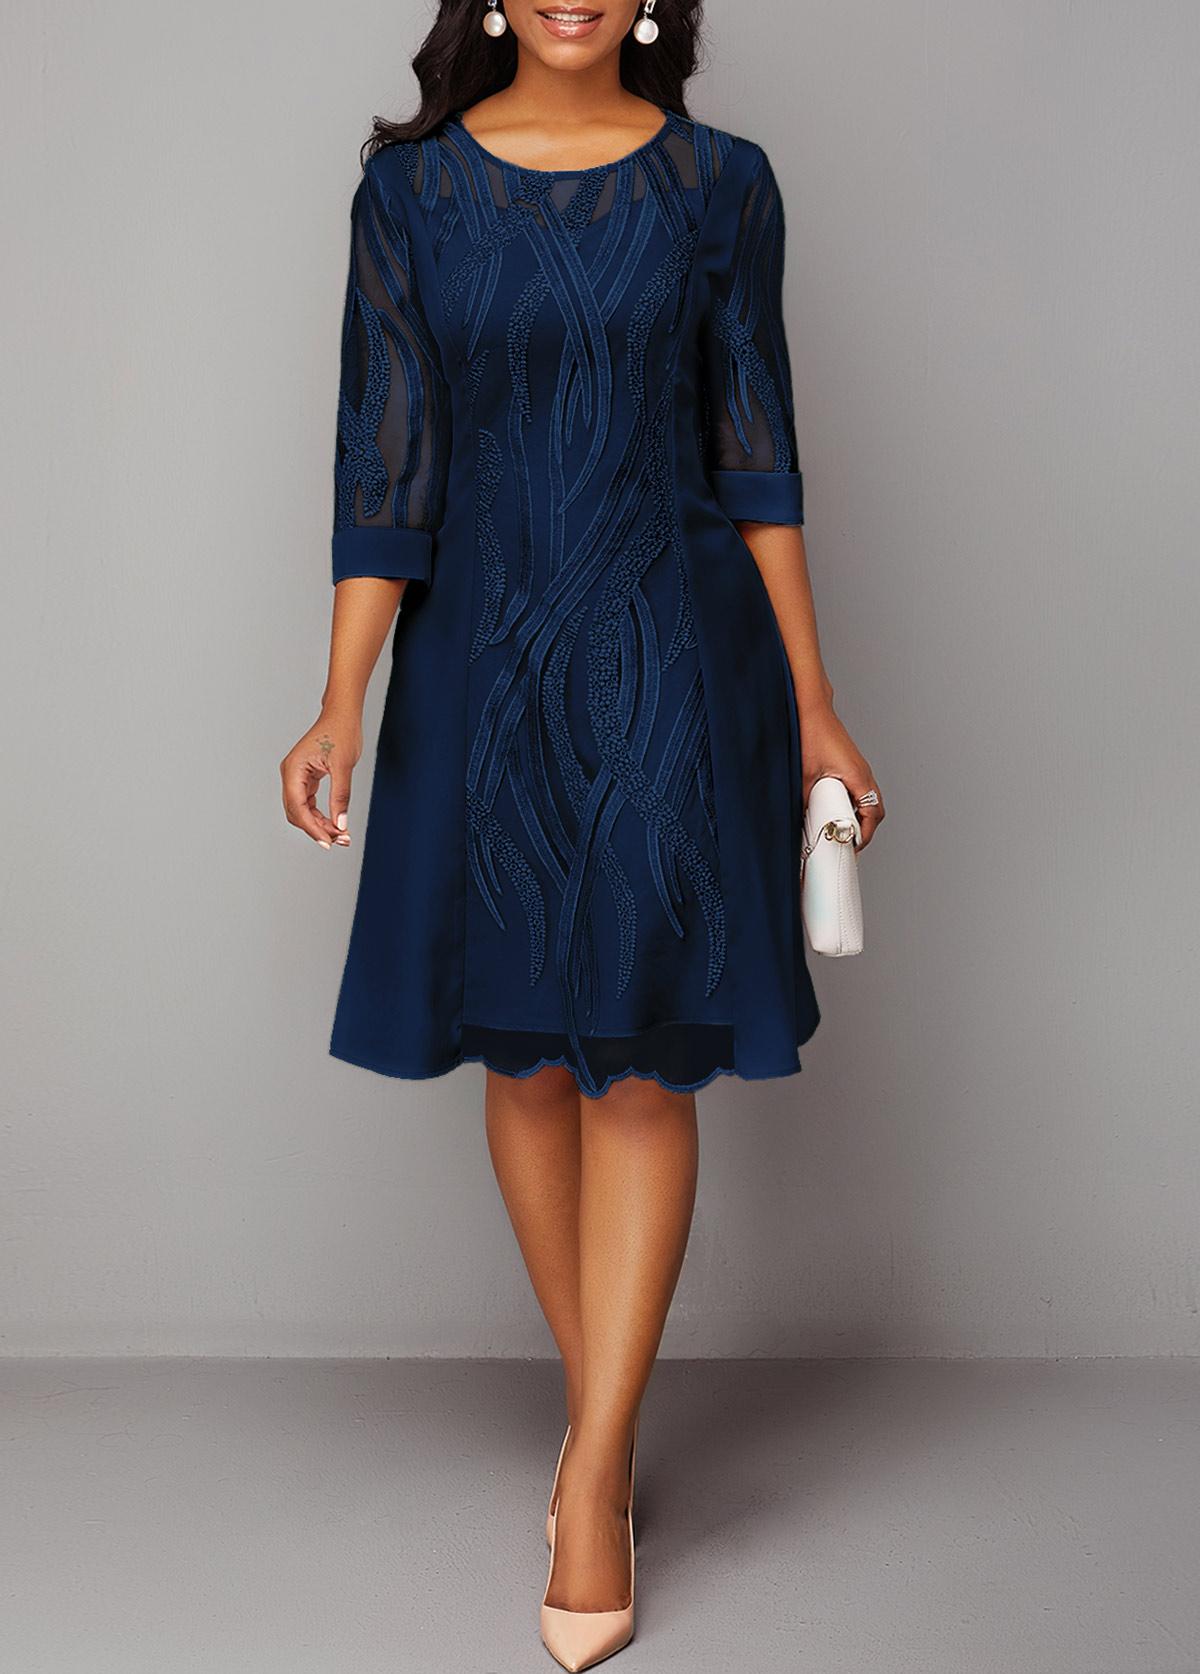 Navy Blue Three Quarter Sleeve Round Neck Lace Dress